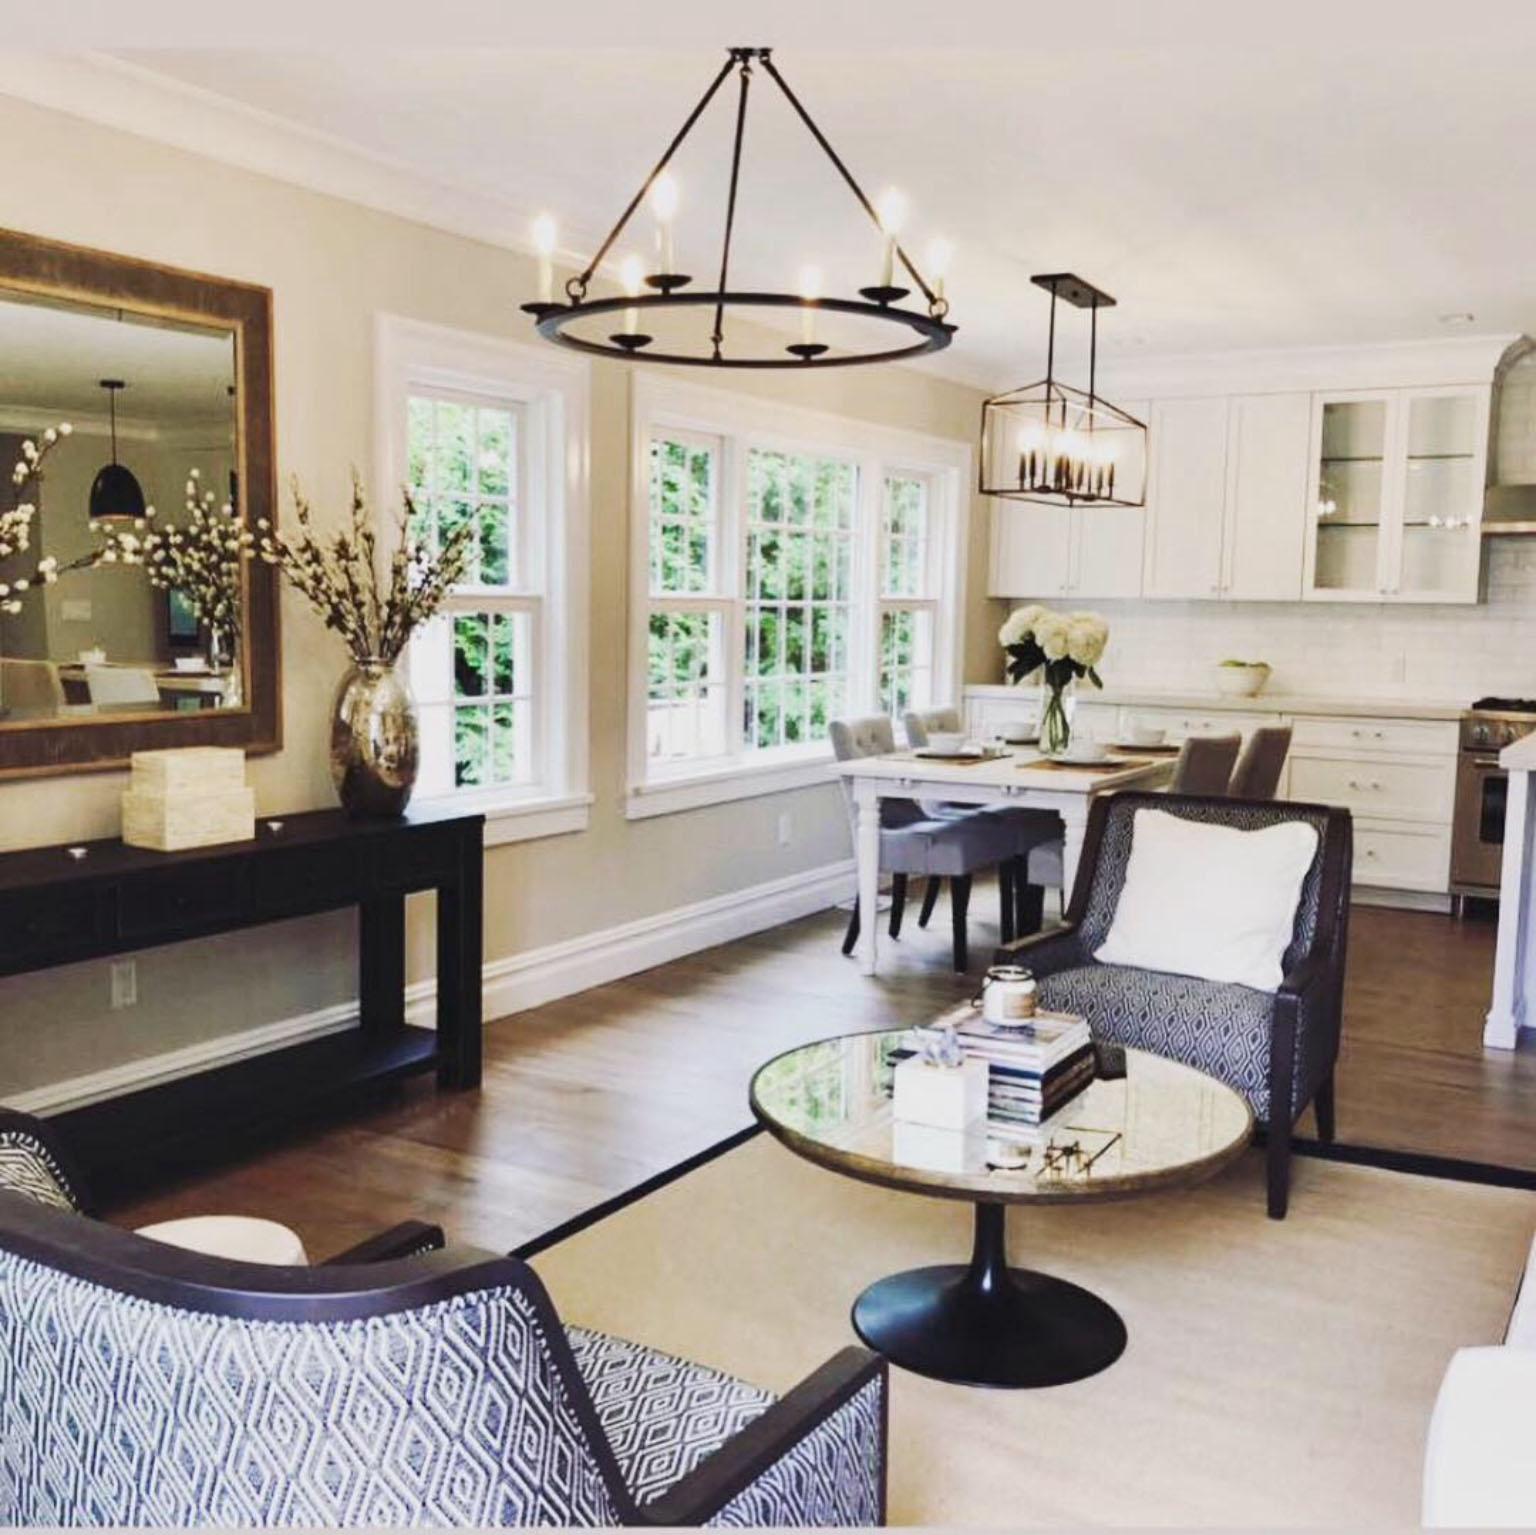 Scarsdale – Modern Farmhouse – Gut renovated